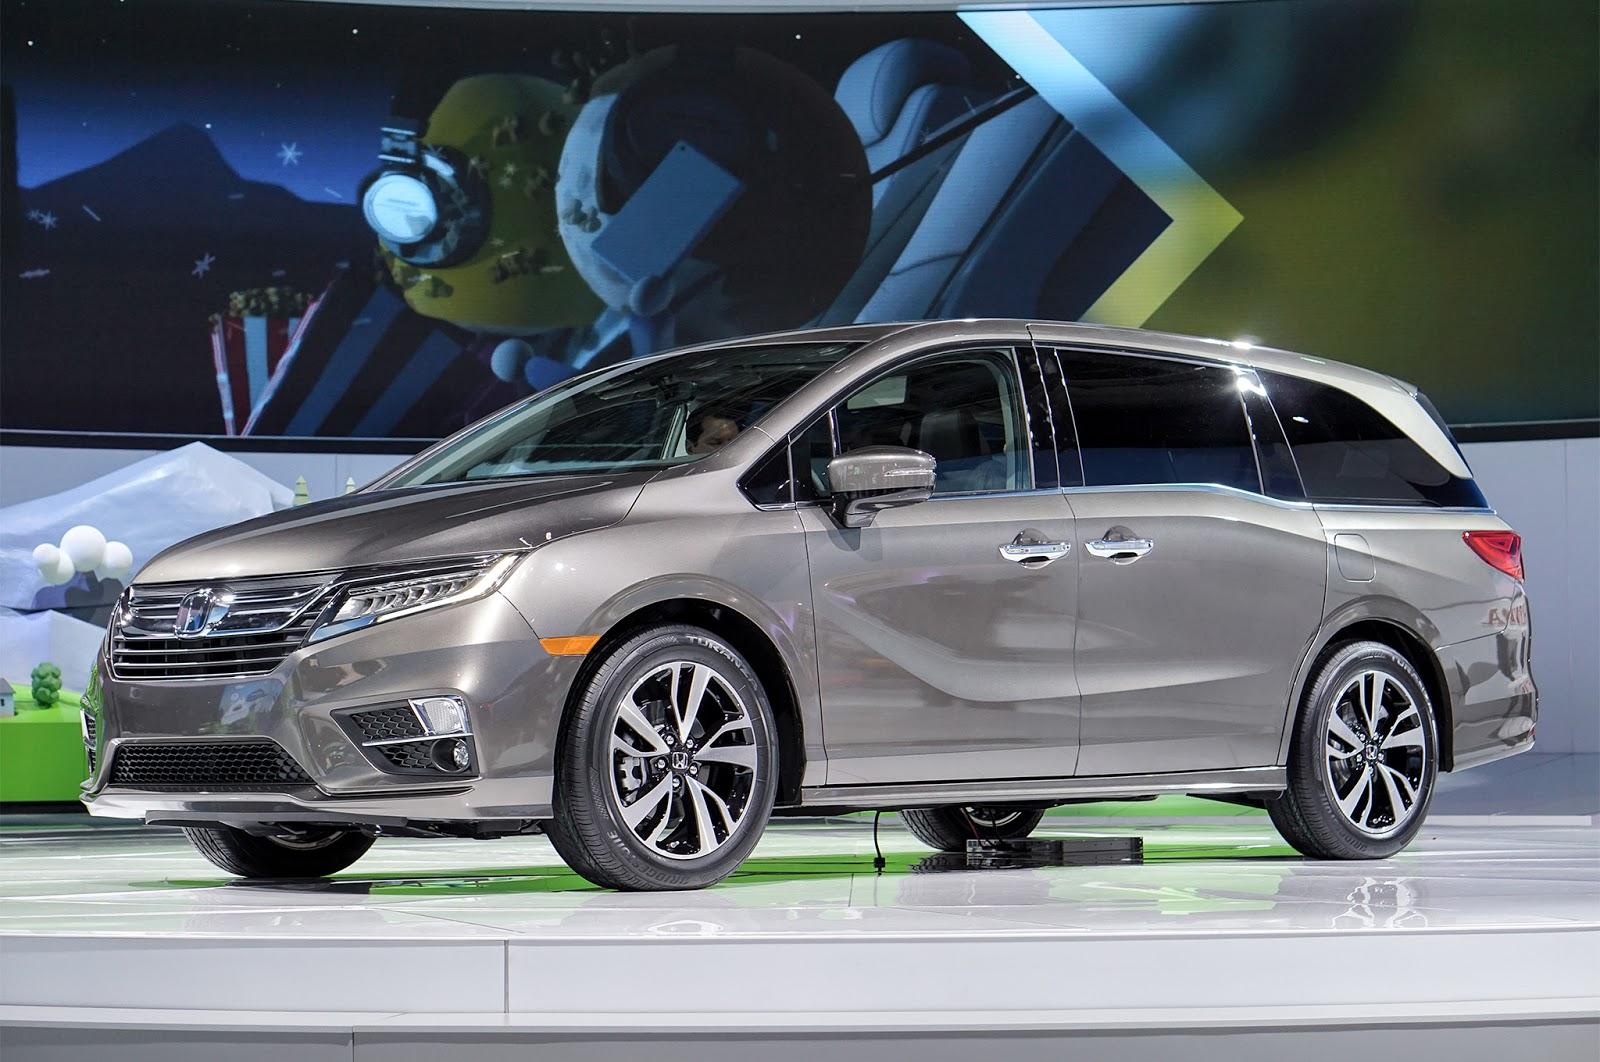 Automotive assembly line 2018 honda odyssey elite review for Honda odyssey elite 2017